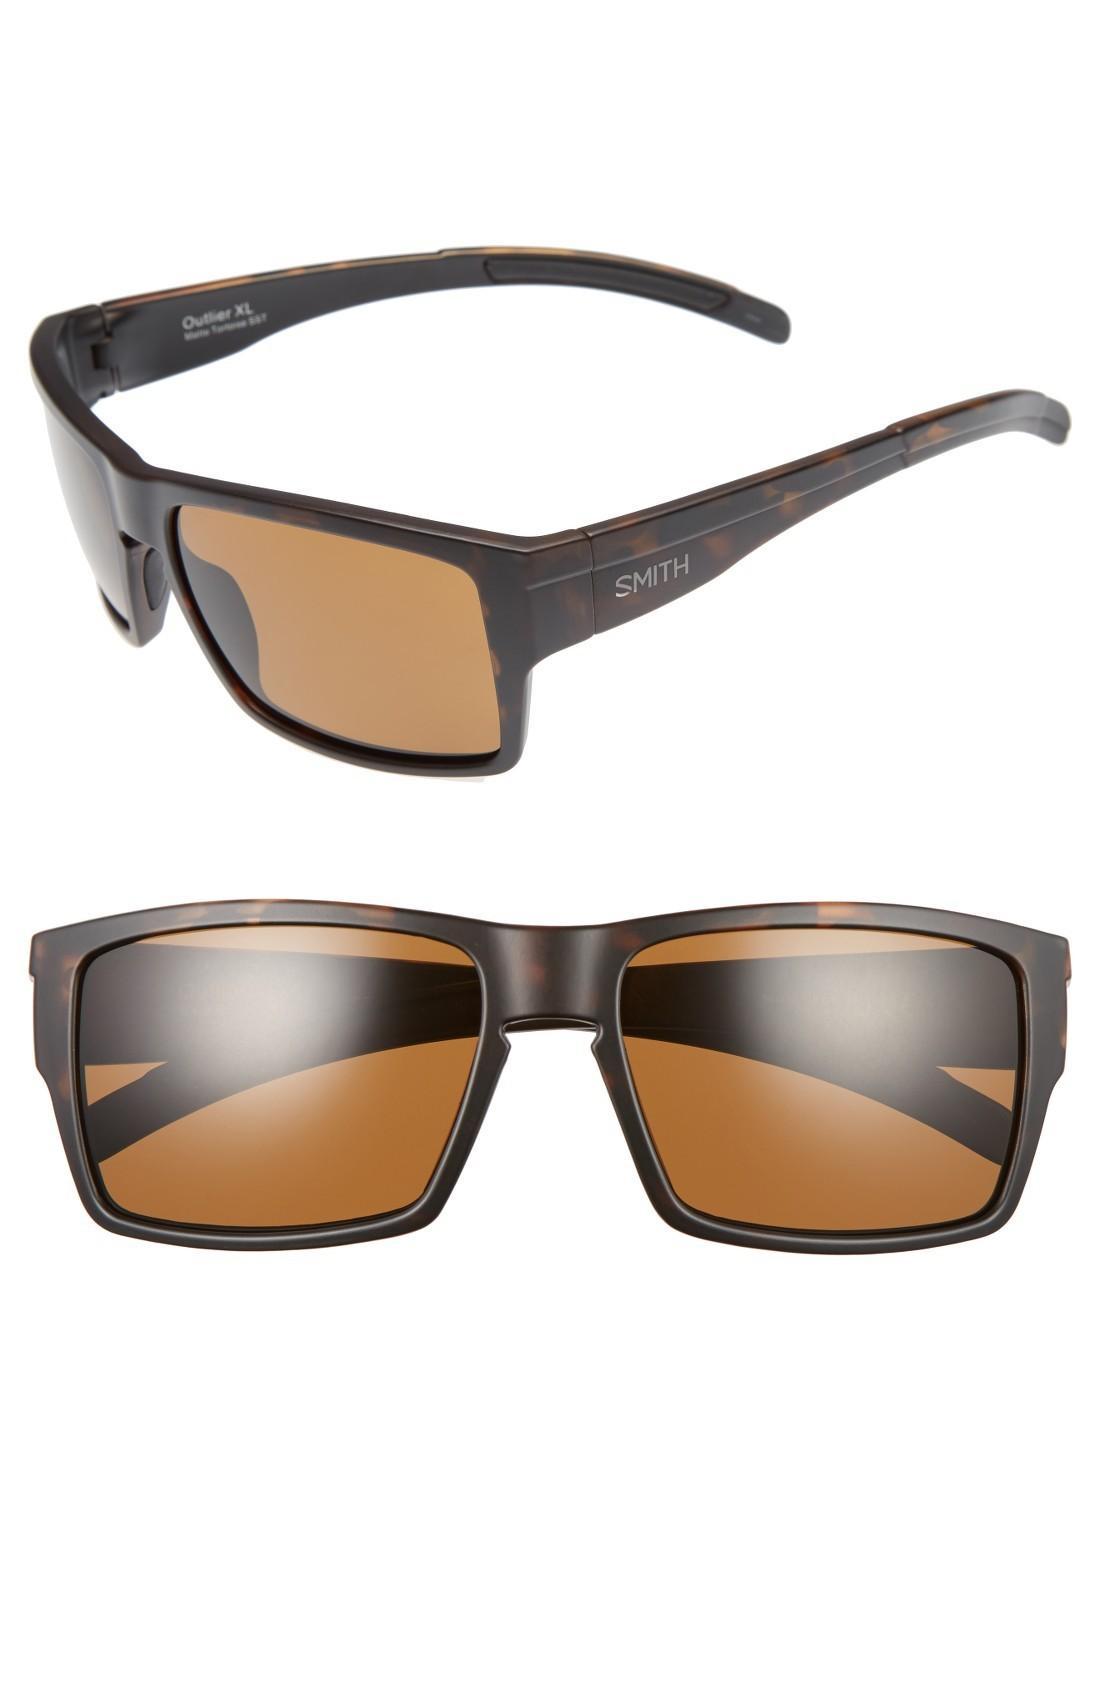 f8e967e04c Smith Outlier Xl 58Mm Polarized Sunglasses - Matte Tortoise  Brown ...